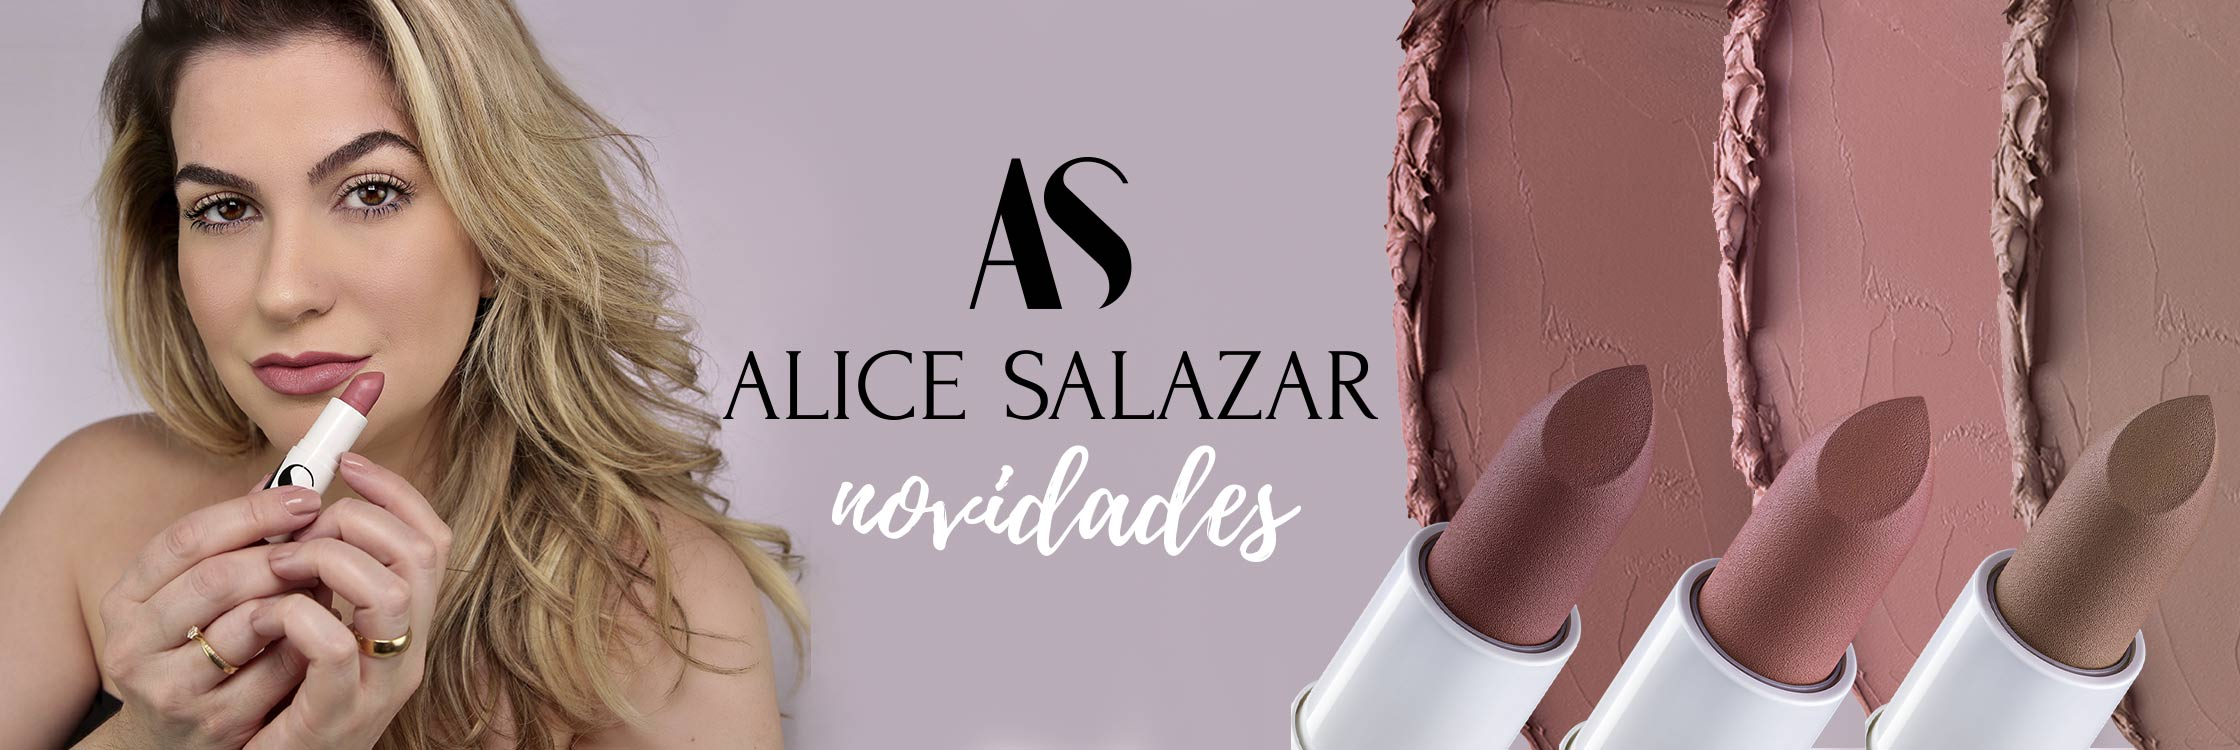 Alice Salazar